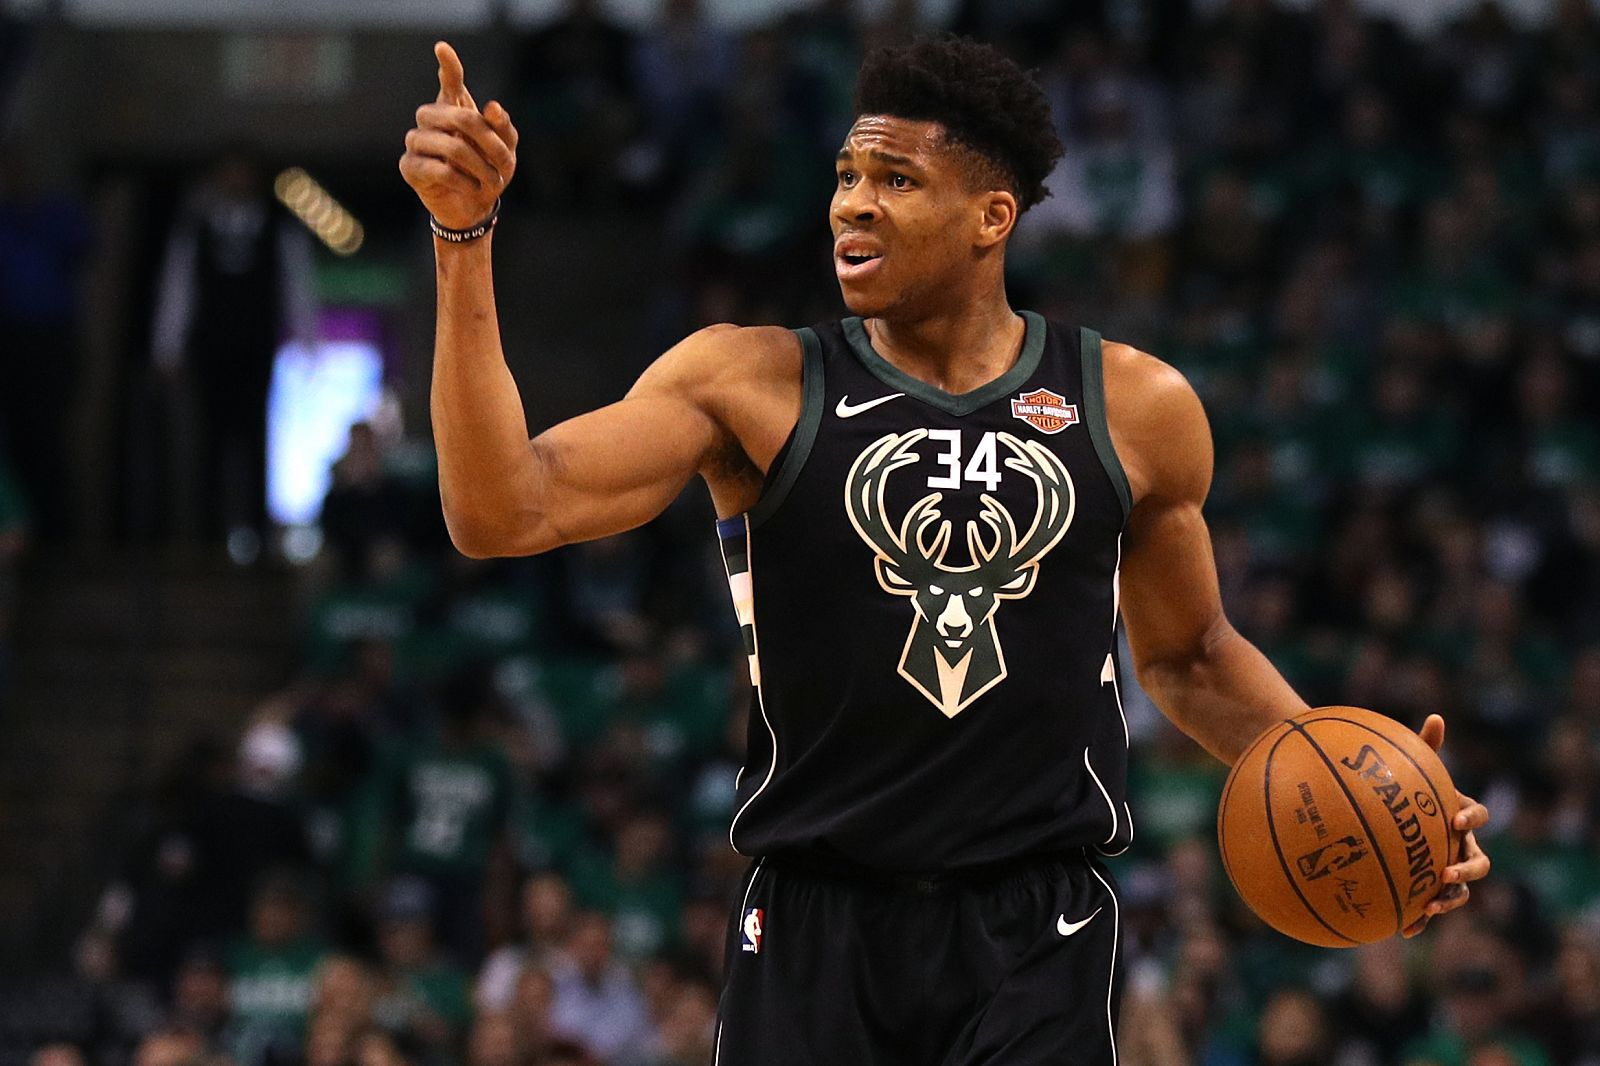 Giannis Antetokounmpo wins MVP at the 2019 NBA Awards